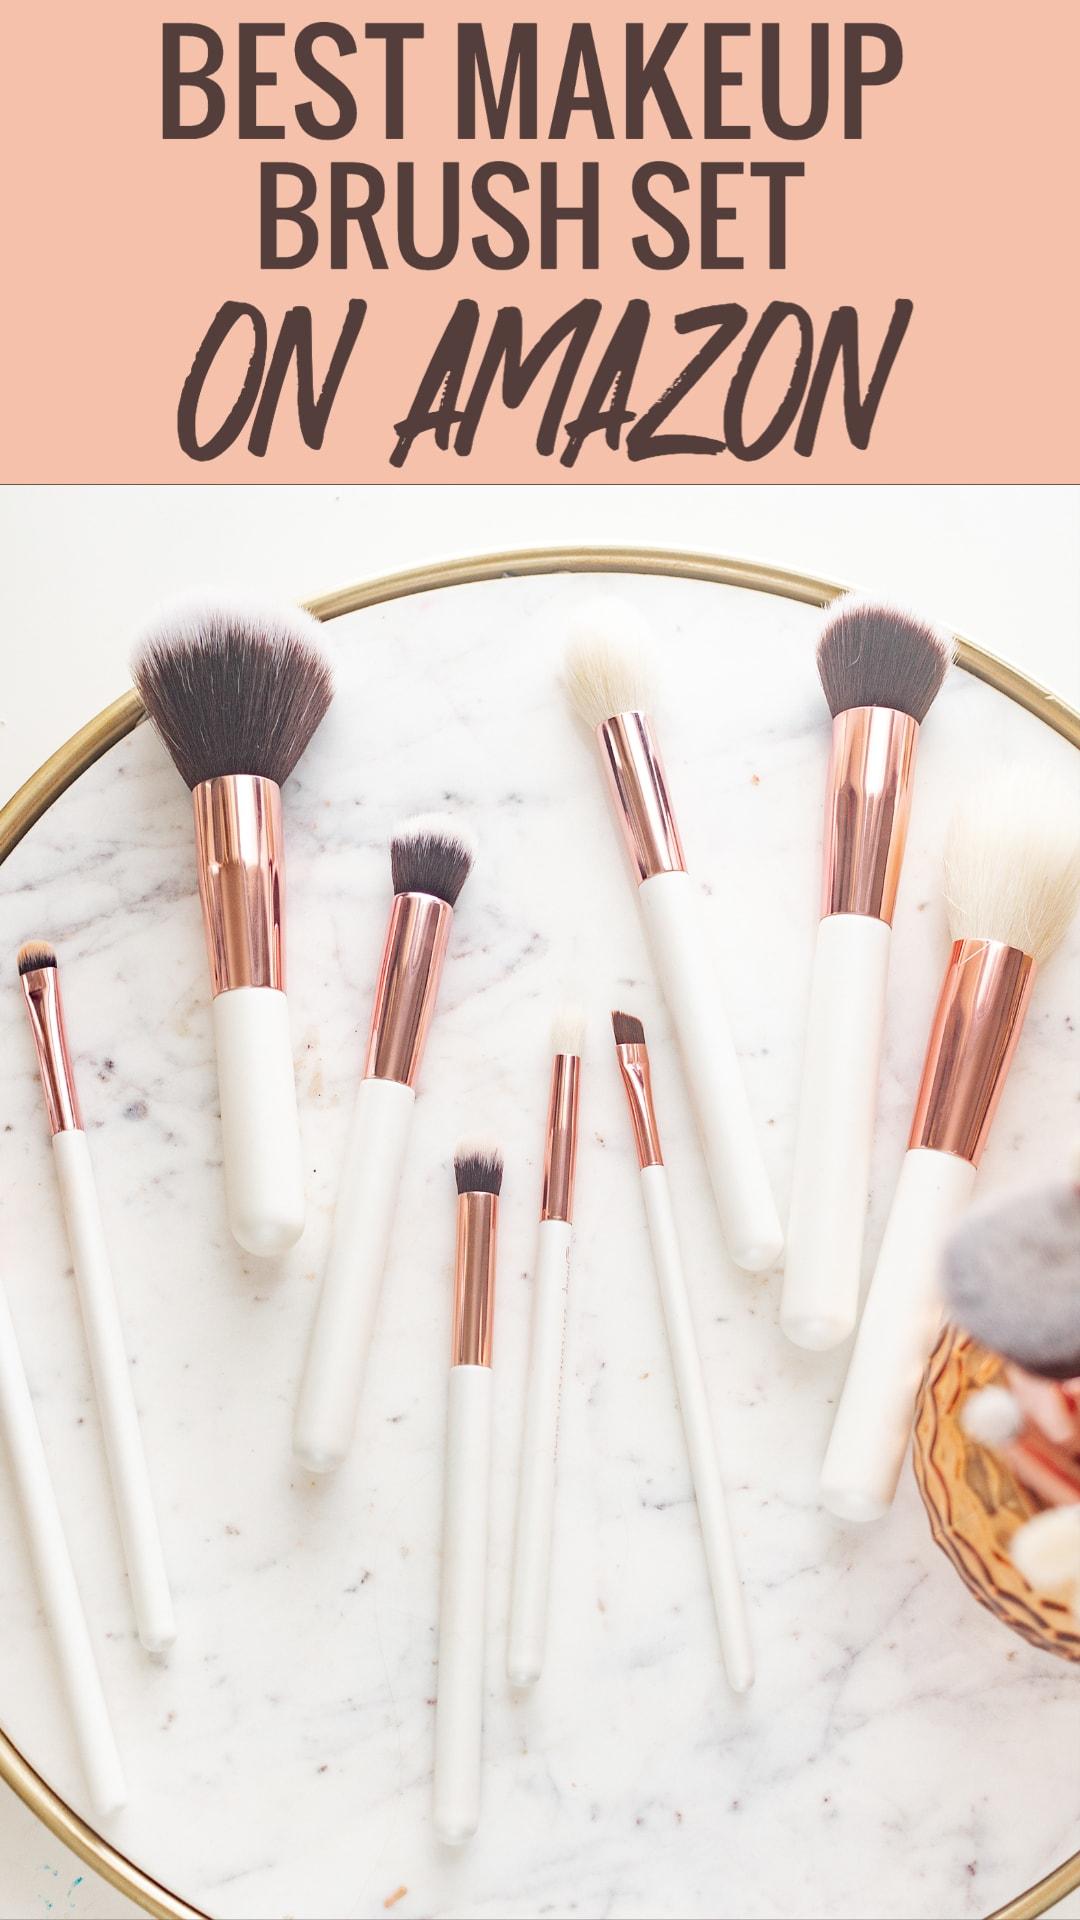 Best makeup brush set on Amazon 2020